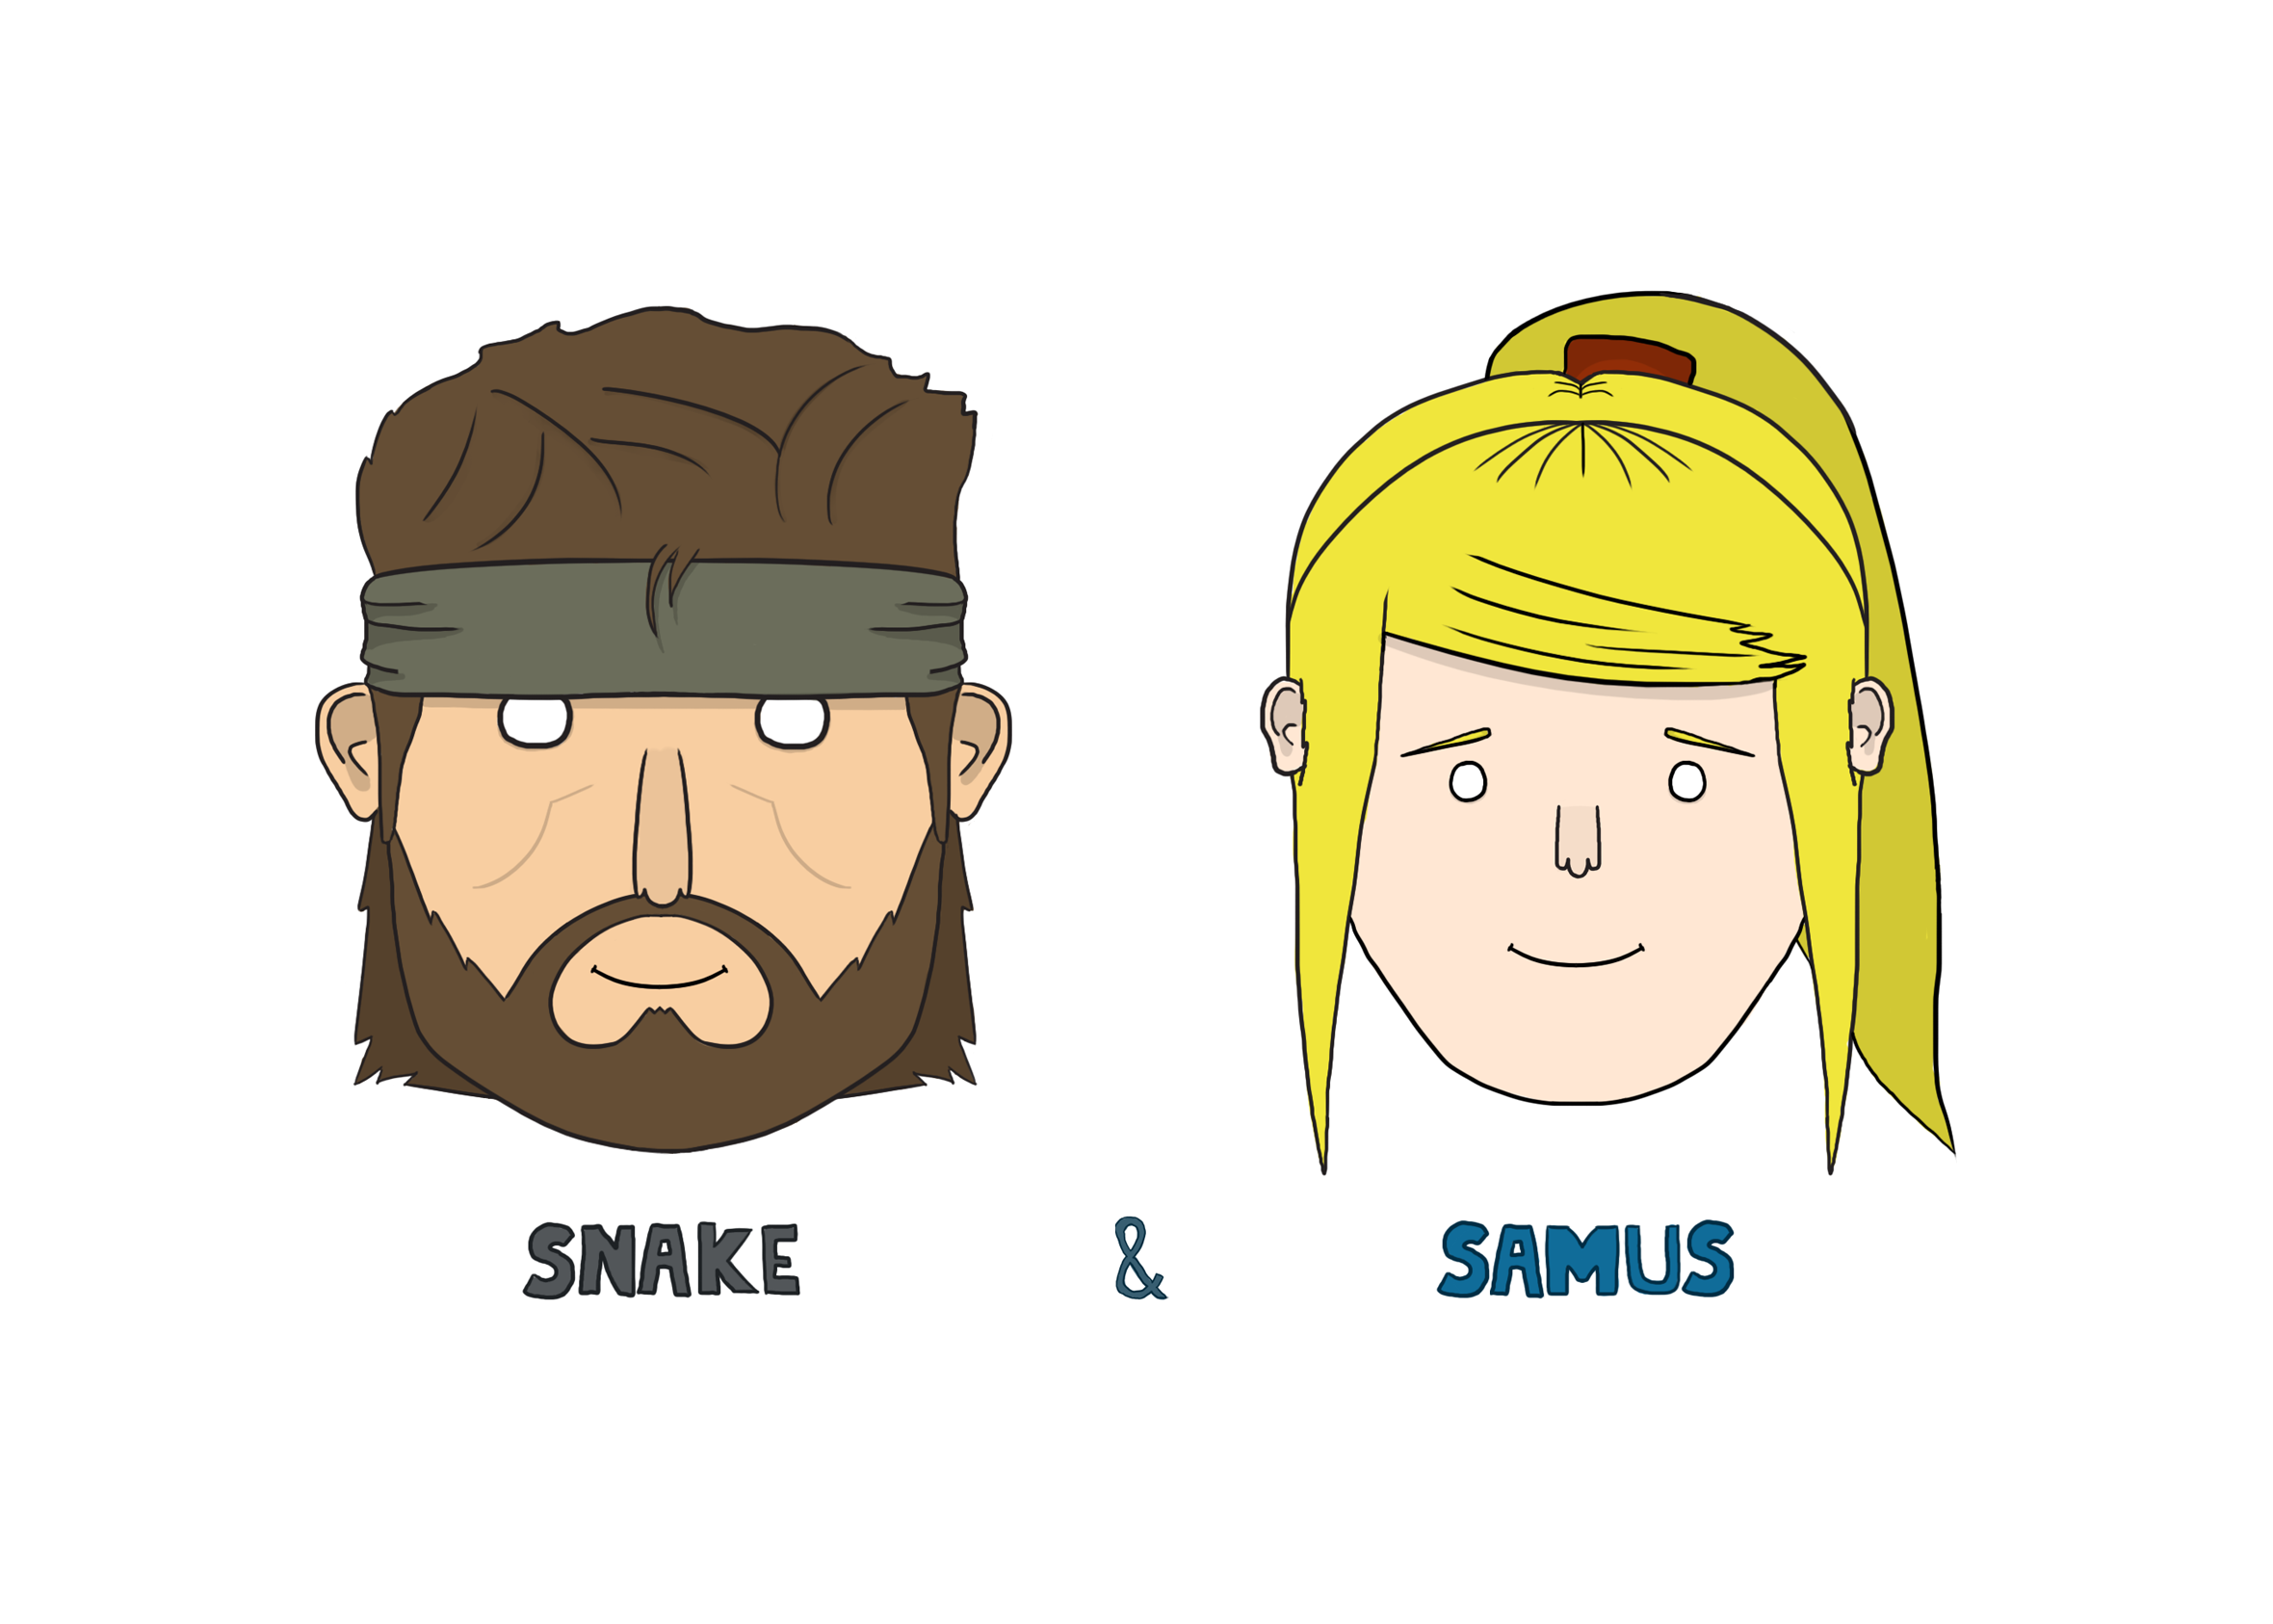 Snake and Samus